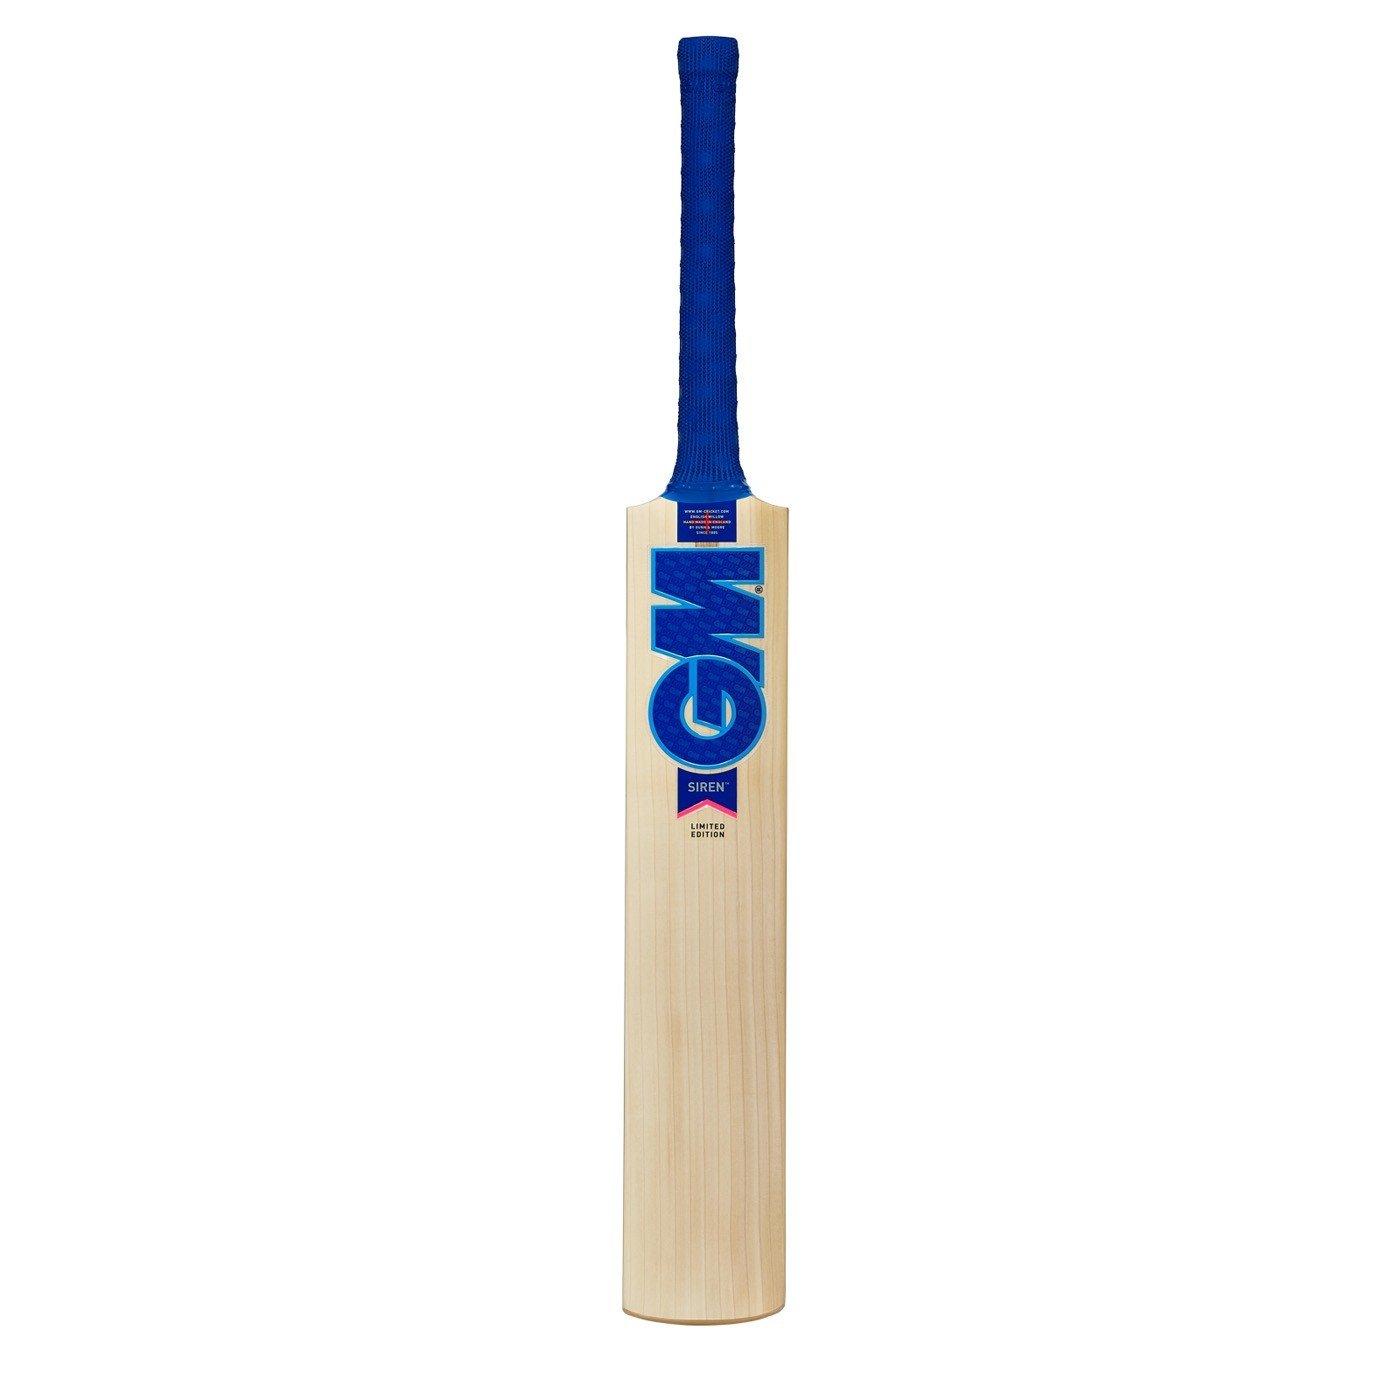 Gunn and Moore Siren DXM 404 Cricket Bat